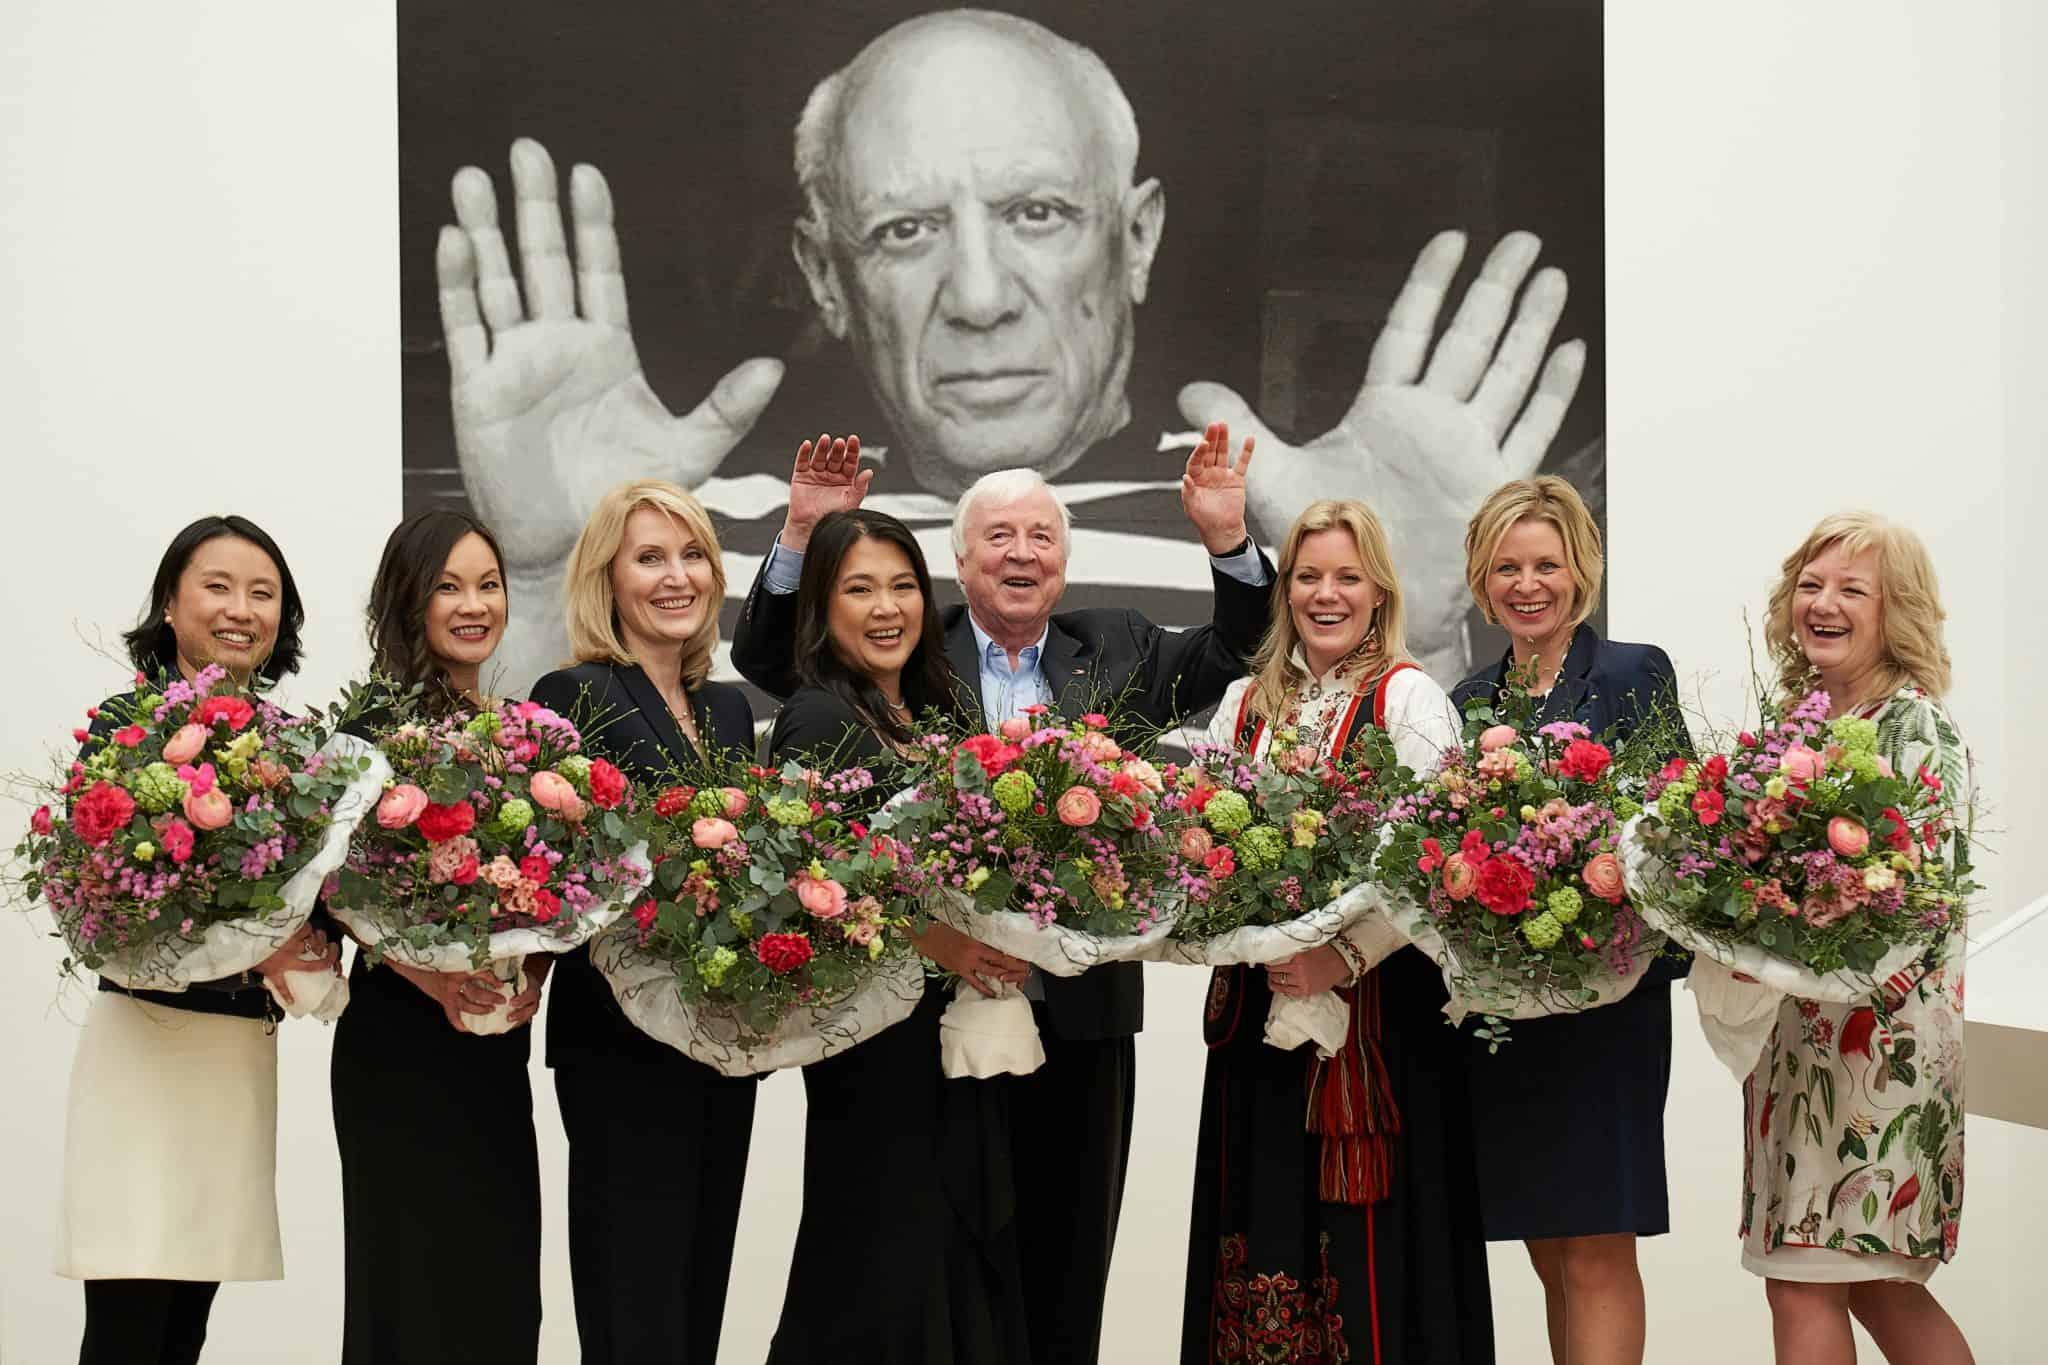 Chairman Torstein Hagen and the Godmothers